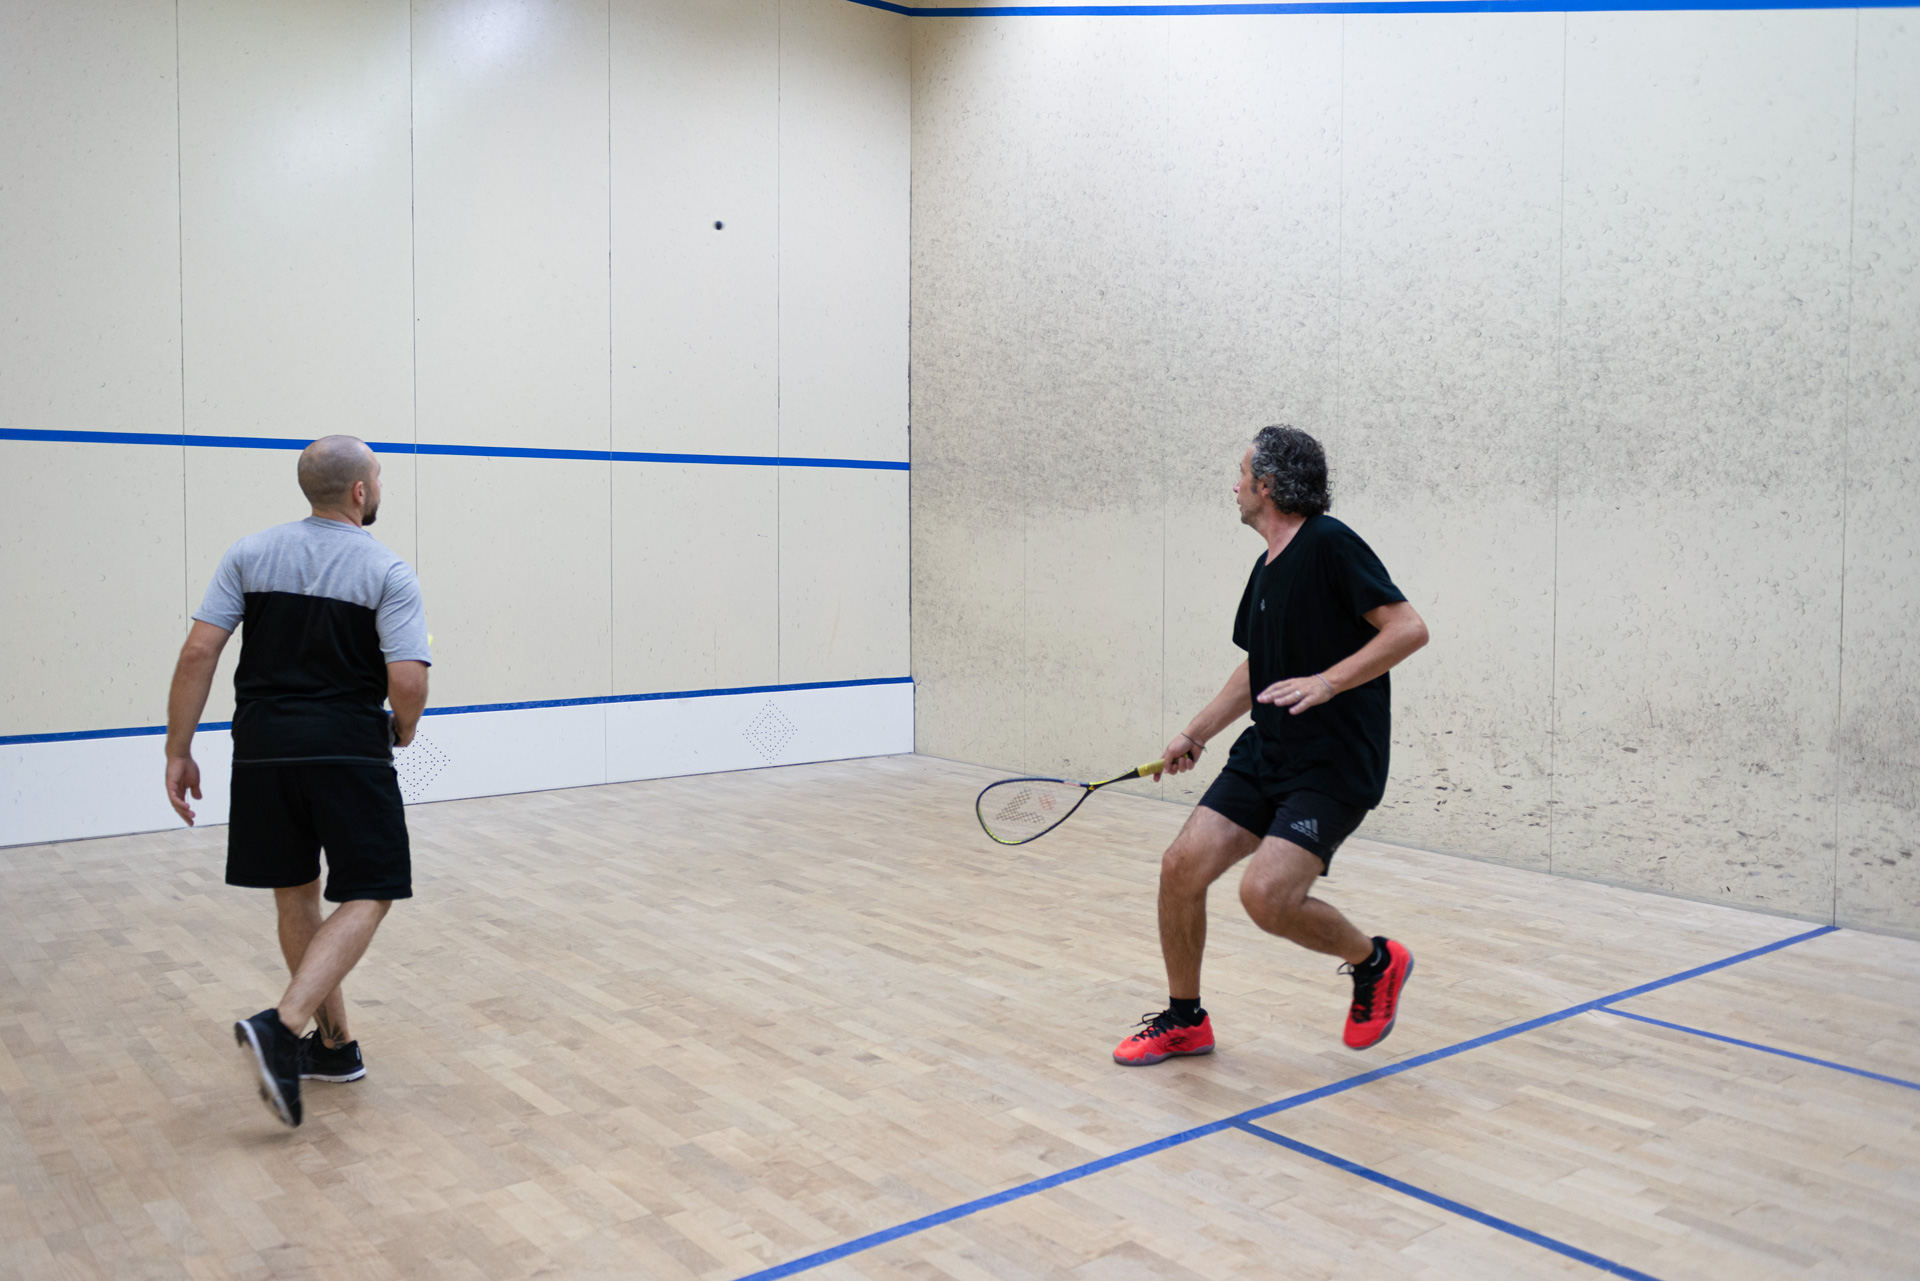 Pole Fitness - Squash